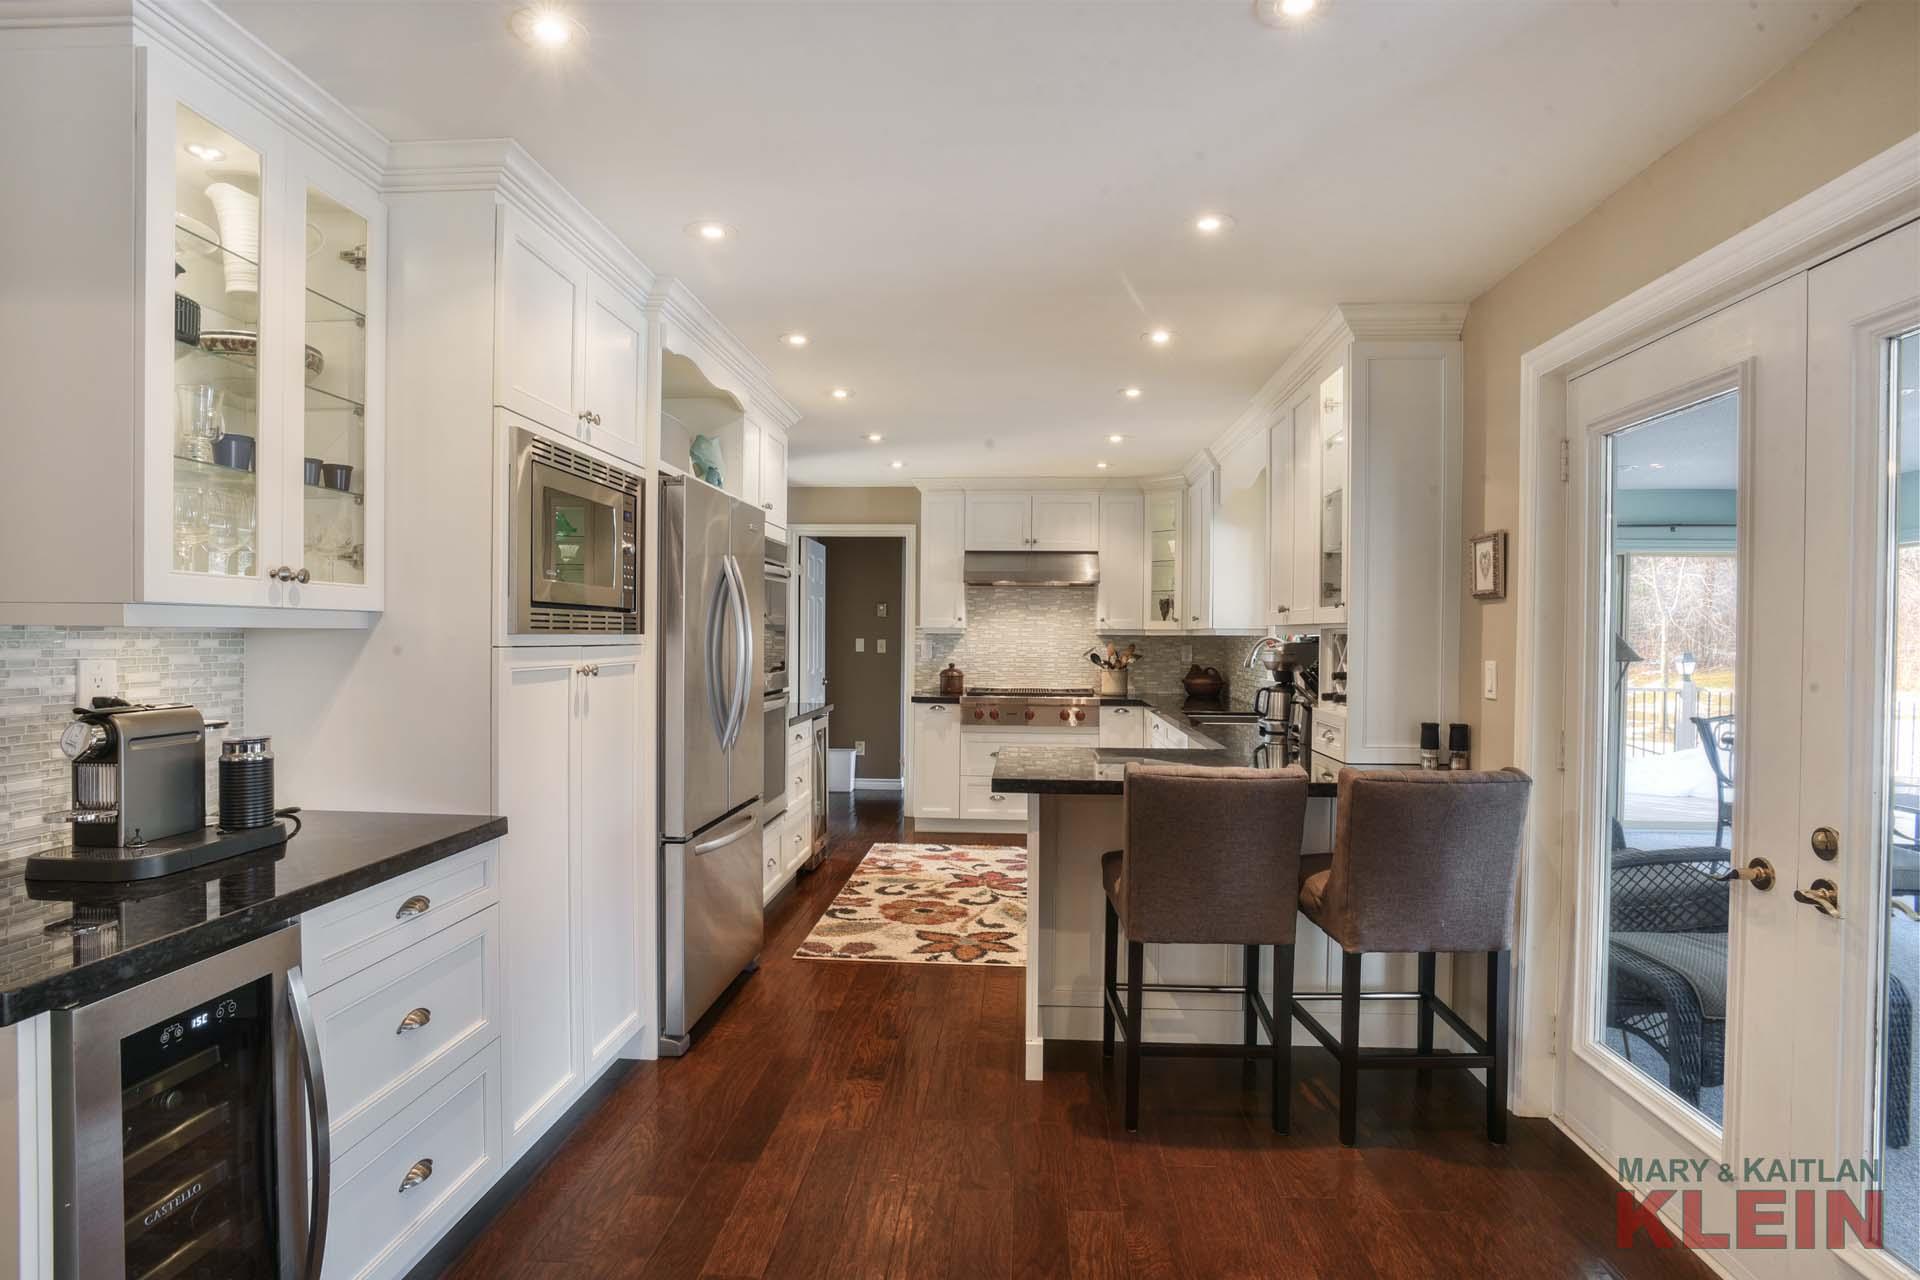 Kitchen, Renovated, Pot lighting